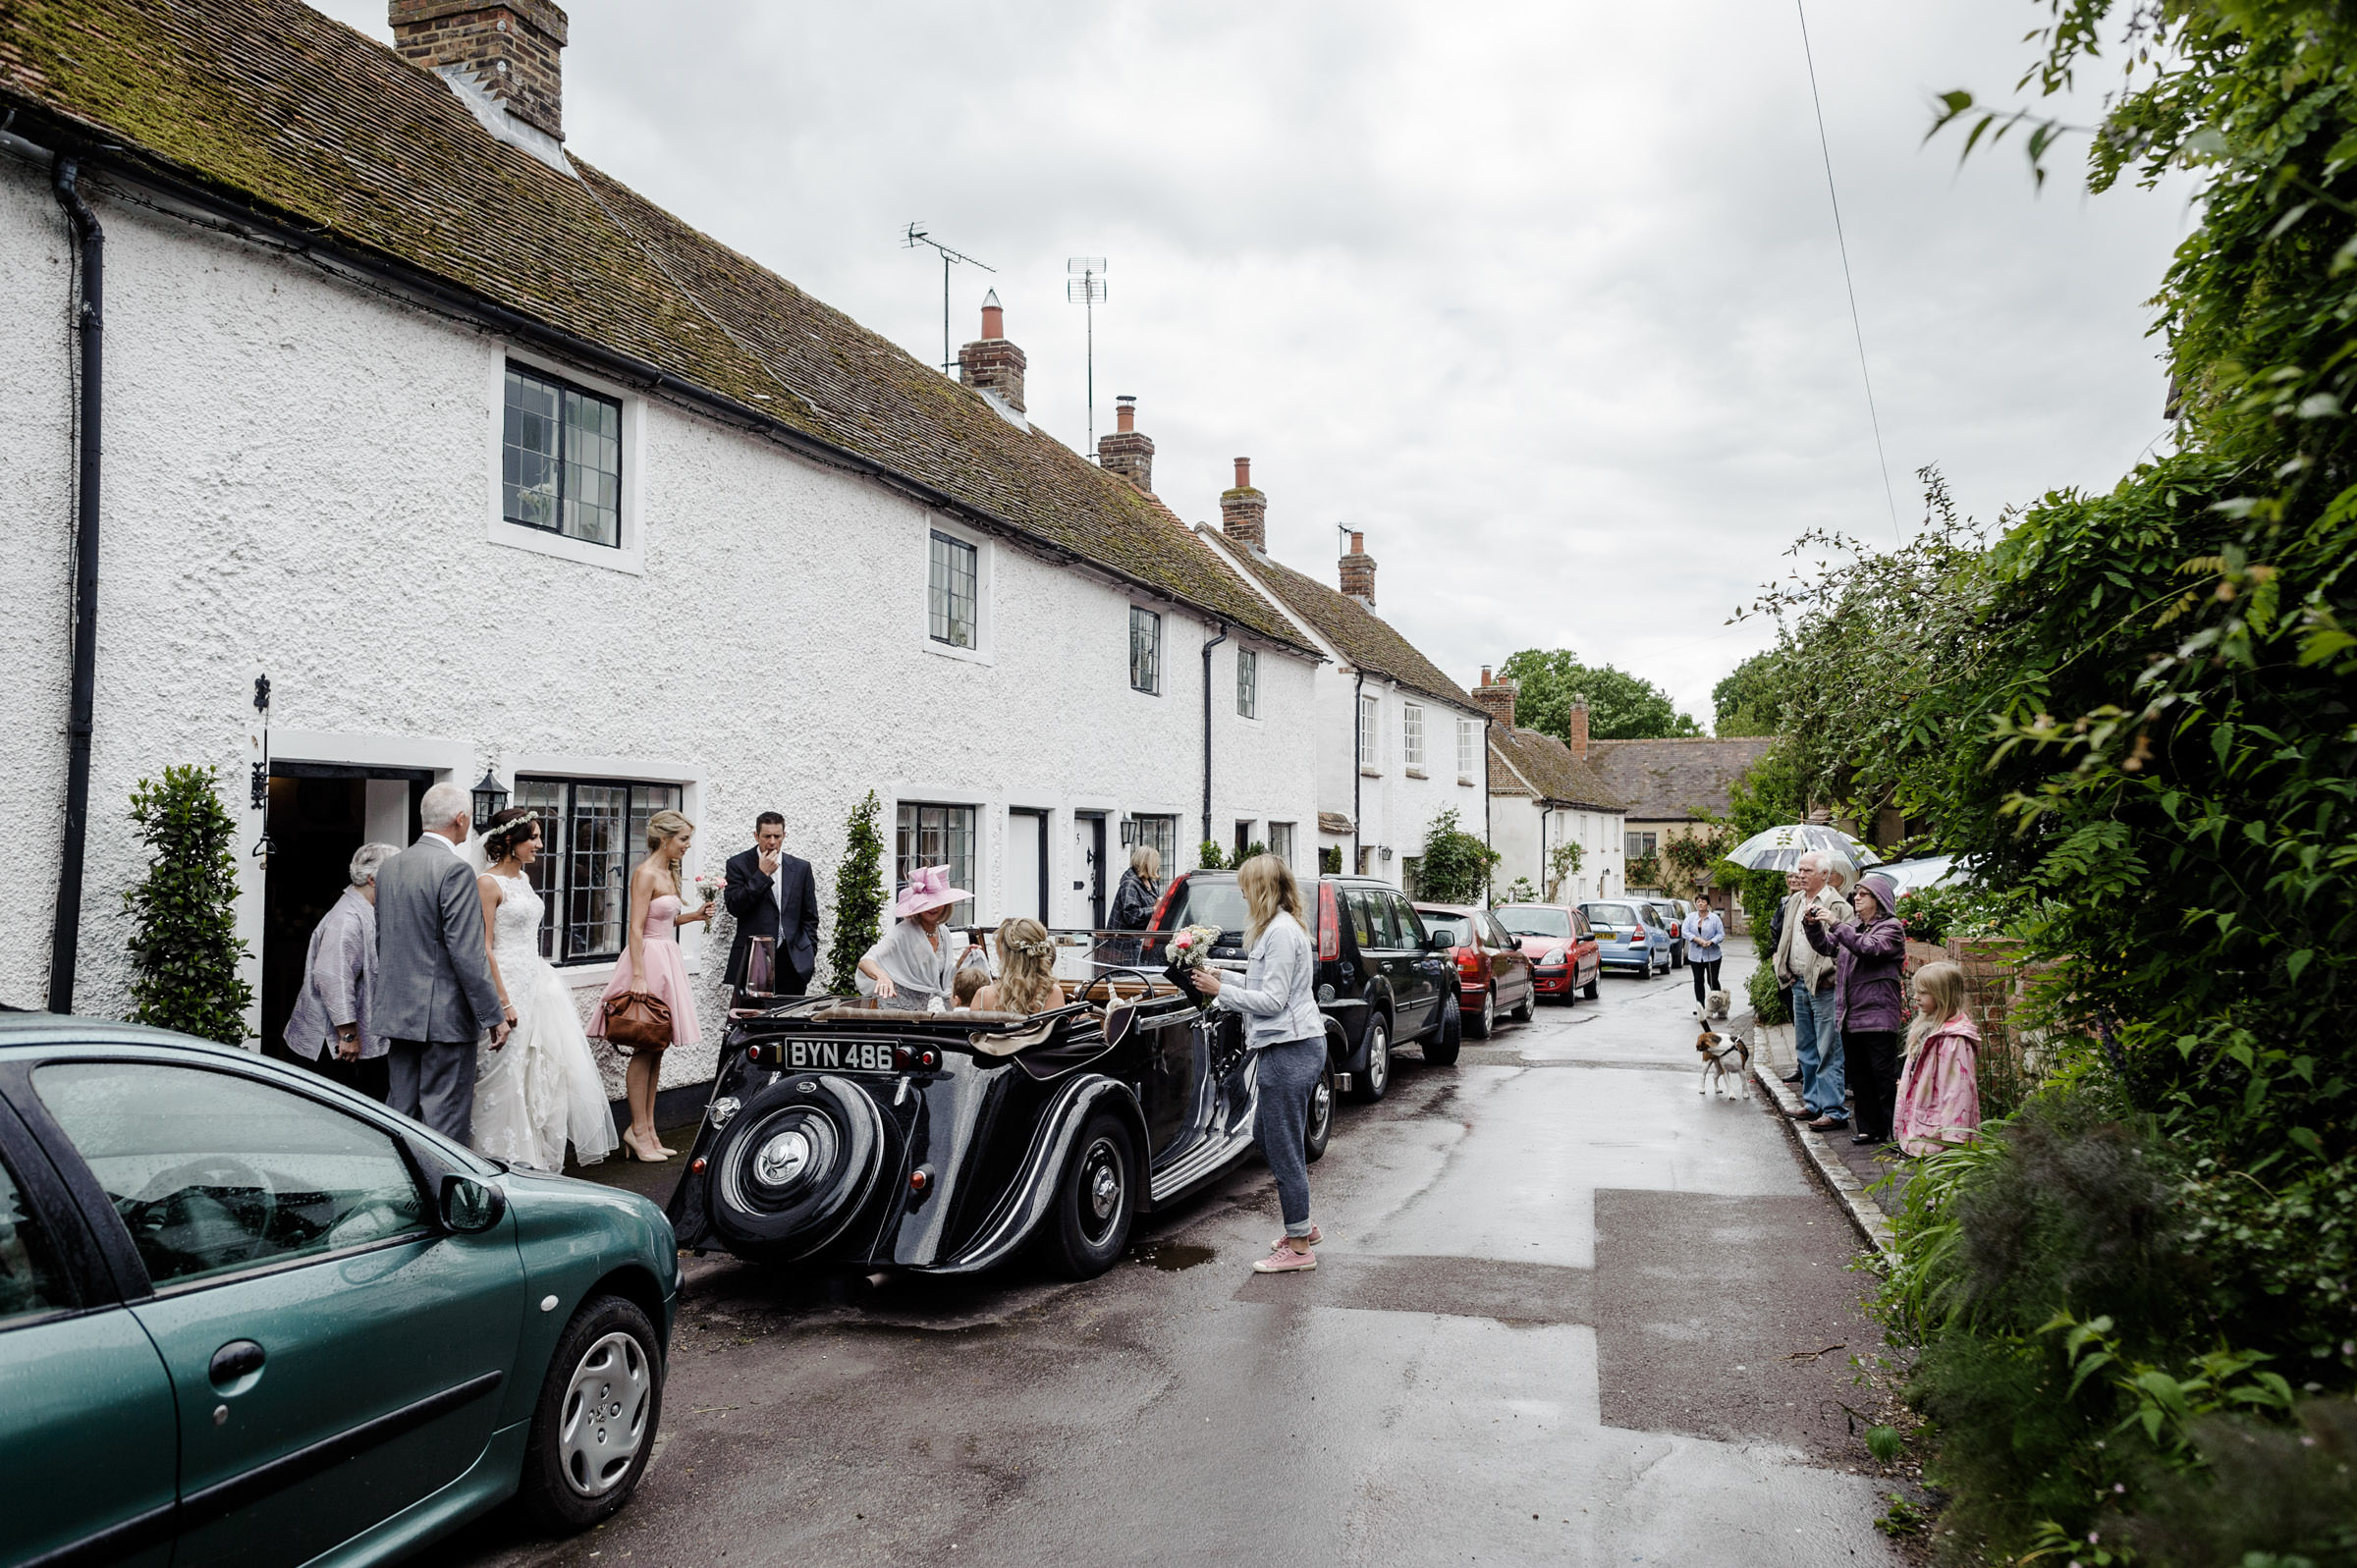 Notley Tythe Barn Reportage Wedding Photos 006.jpg